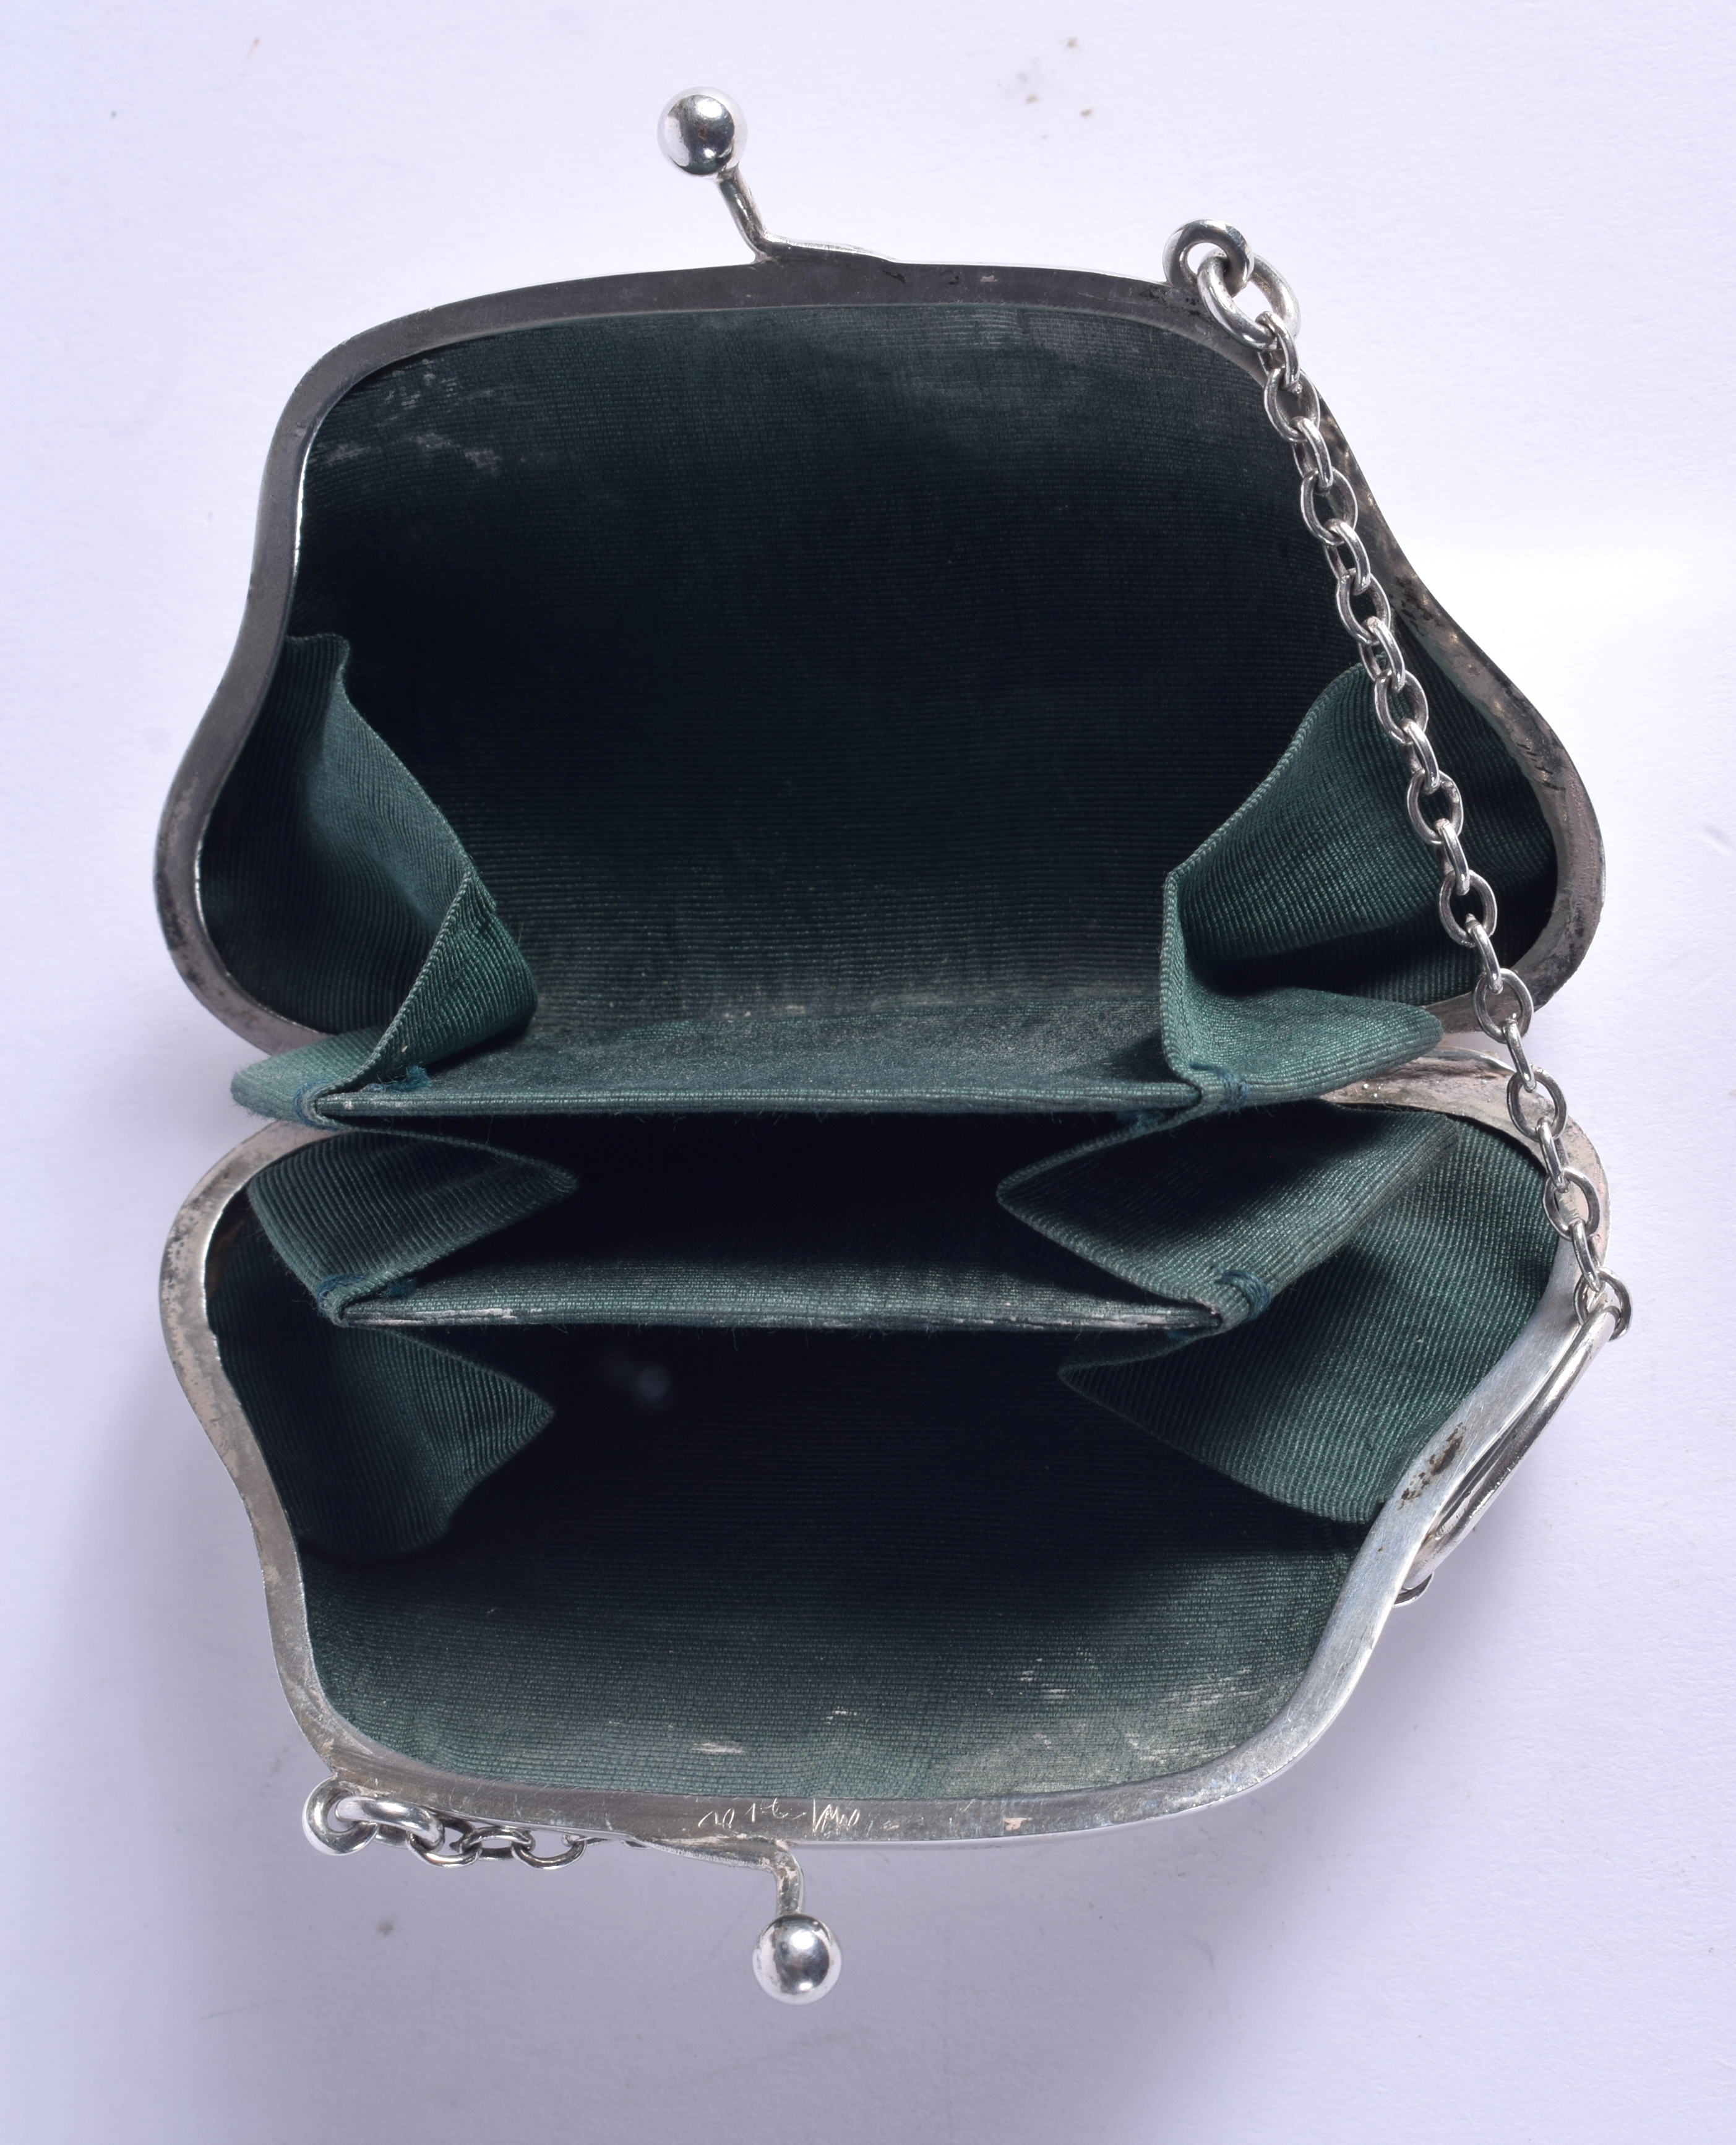 AN ANTIQUE SILVER PURSE. Chester 1915. 49 grams. 9 cm x 6.5 cm. - Image 2 of 2